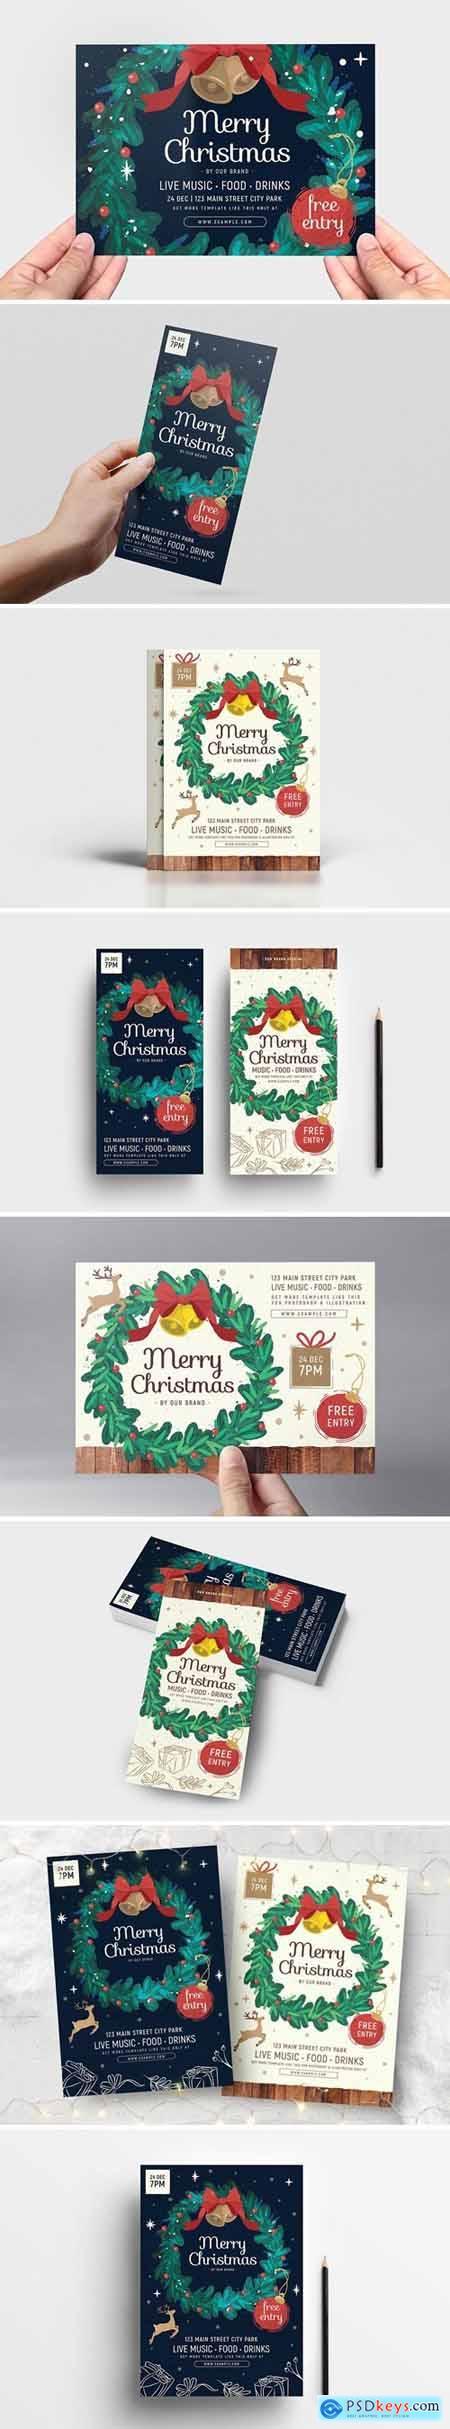 Christmas Wreath Flyer - Poster Templates